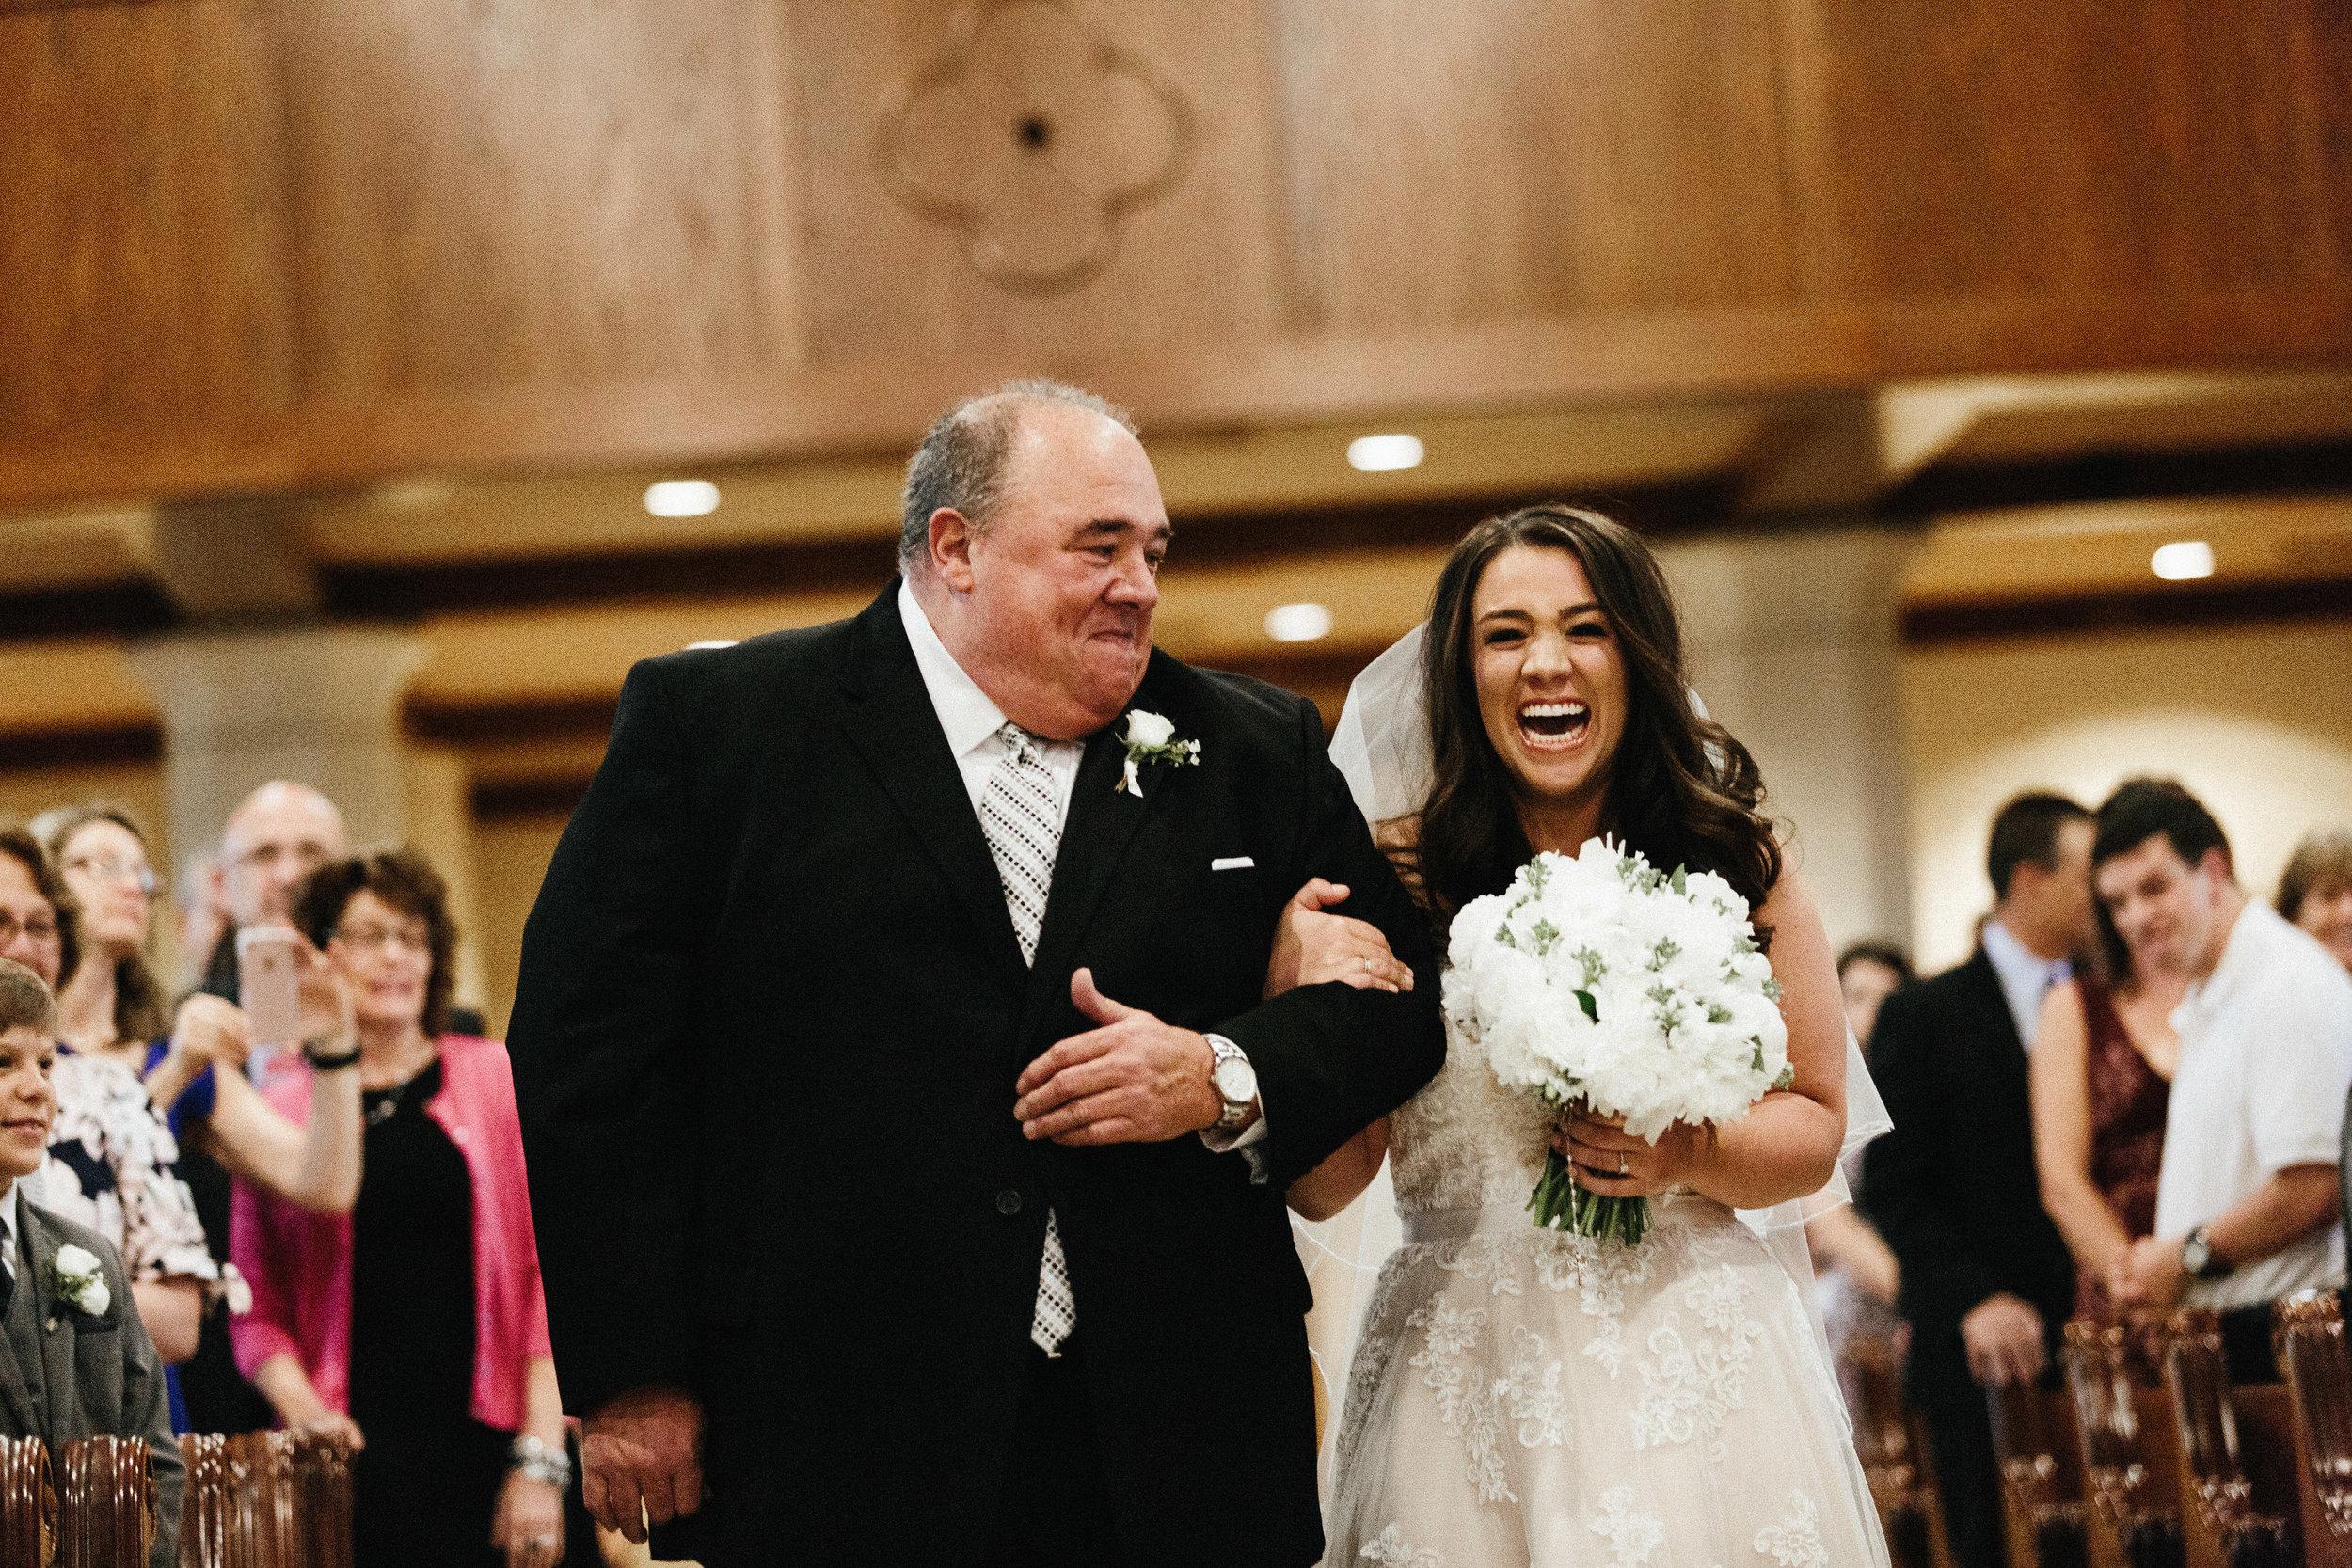 roswell_st_peter_chanel_catholic_avalon_hotel_alpharetta_wedding-1441.jpg